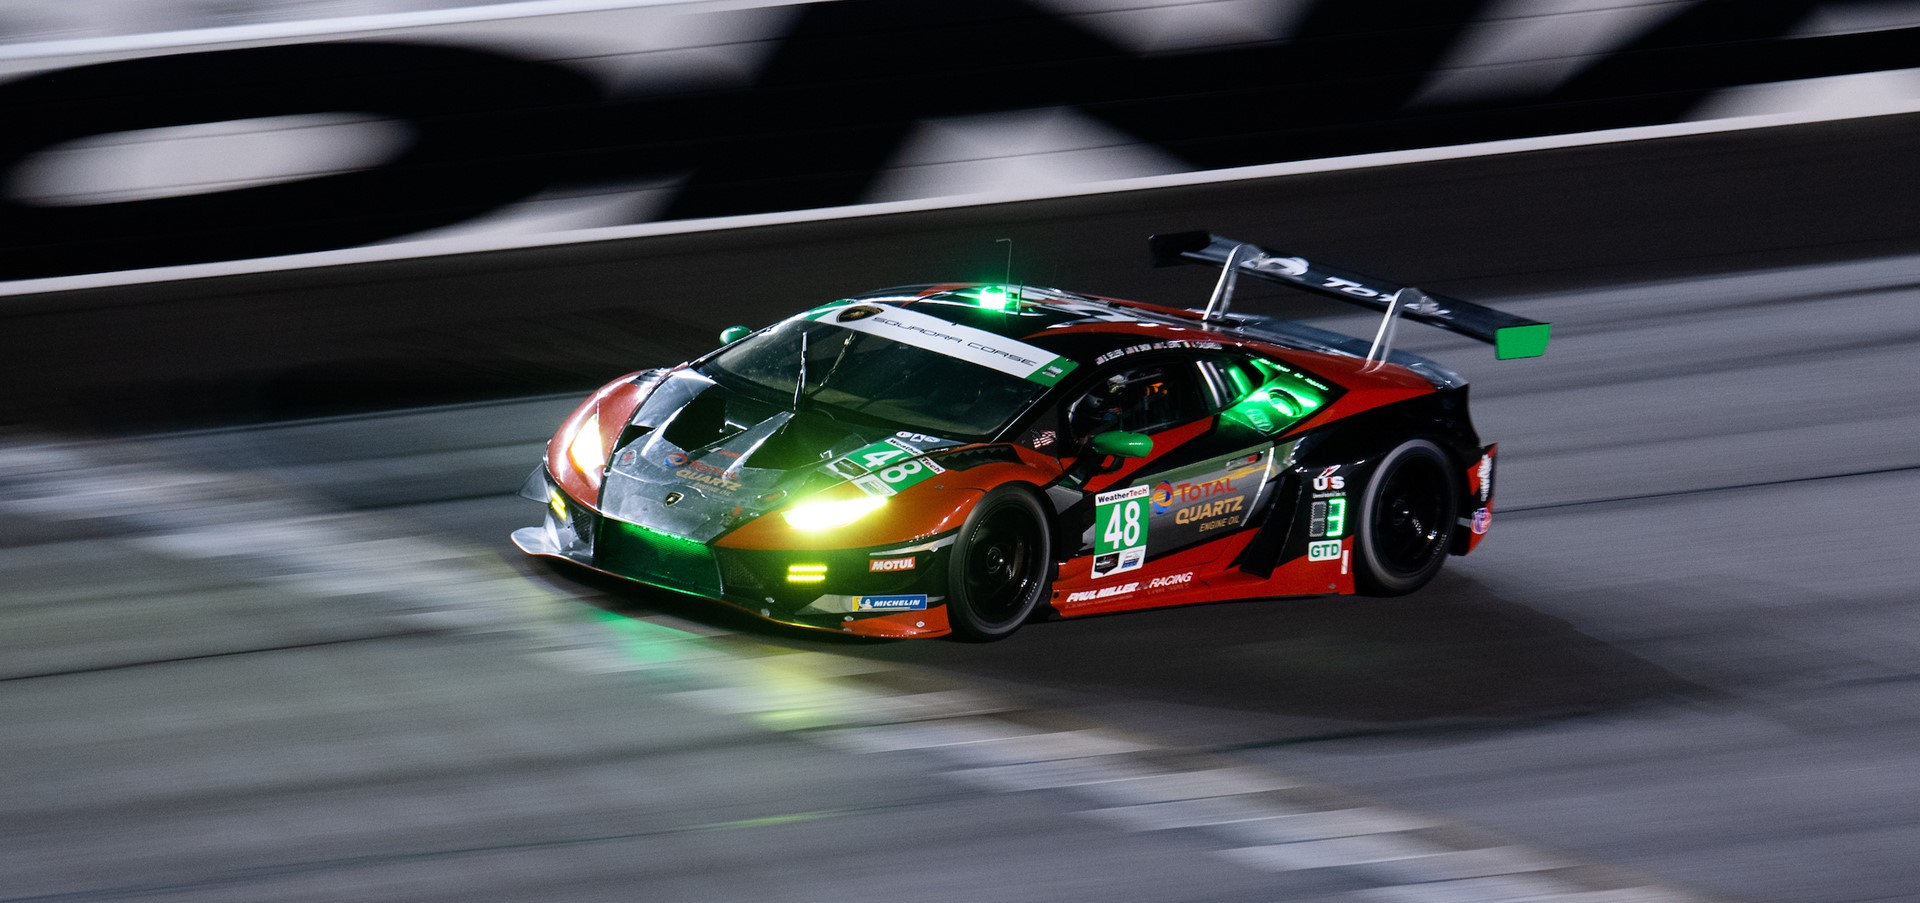 Dritter Triumph in Folge und Doppelsieg für Lamborghini..